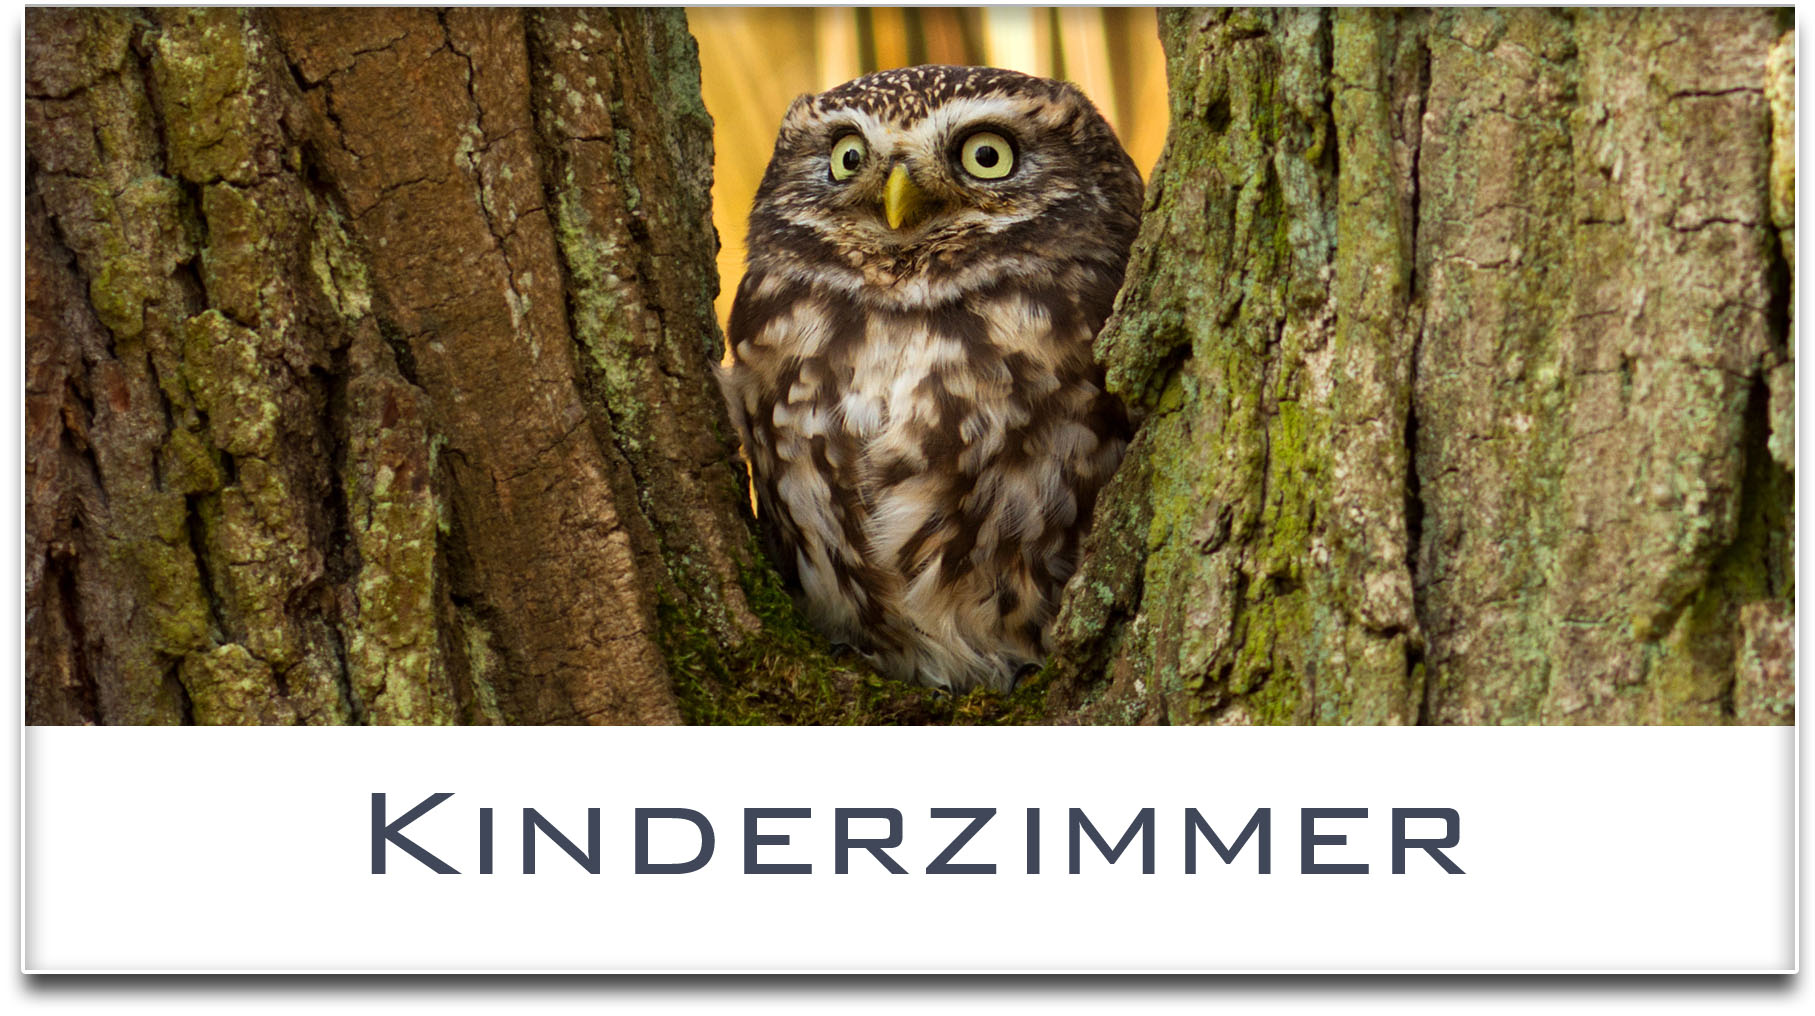 Türschild / Haustürschild / Eule / Kinderzimmer / Selbstklebend